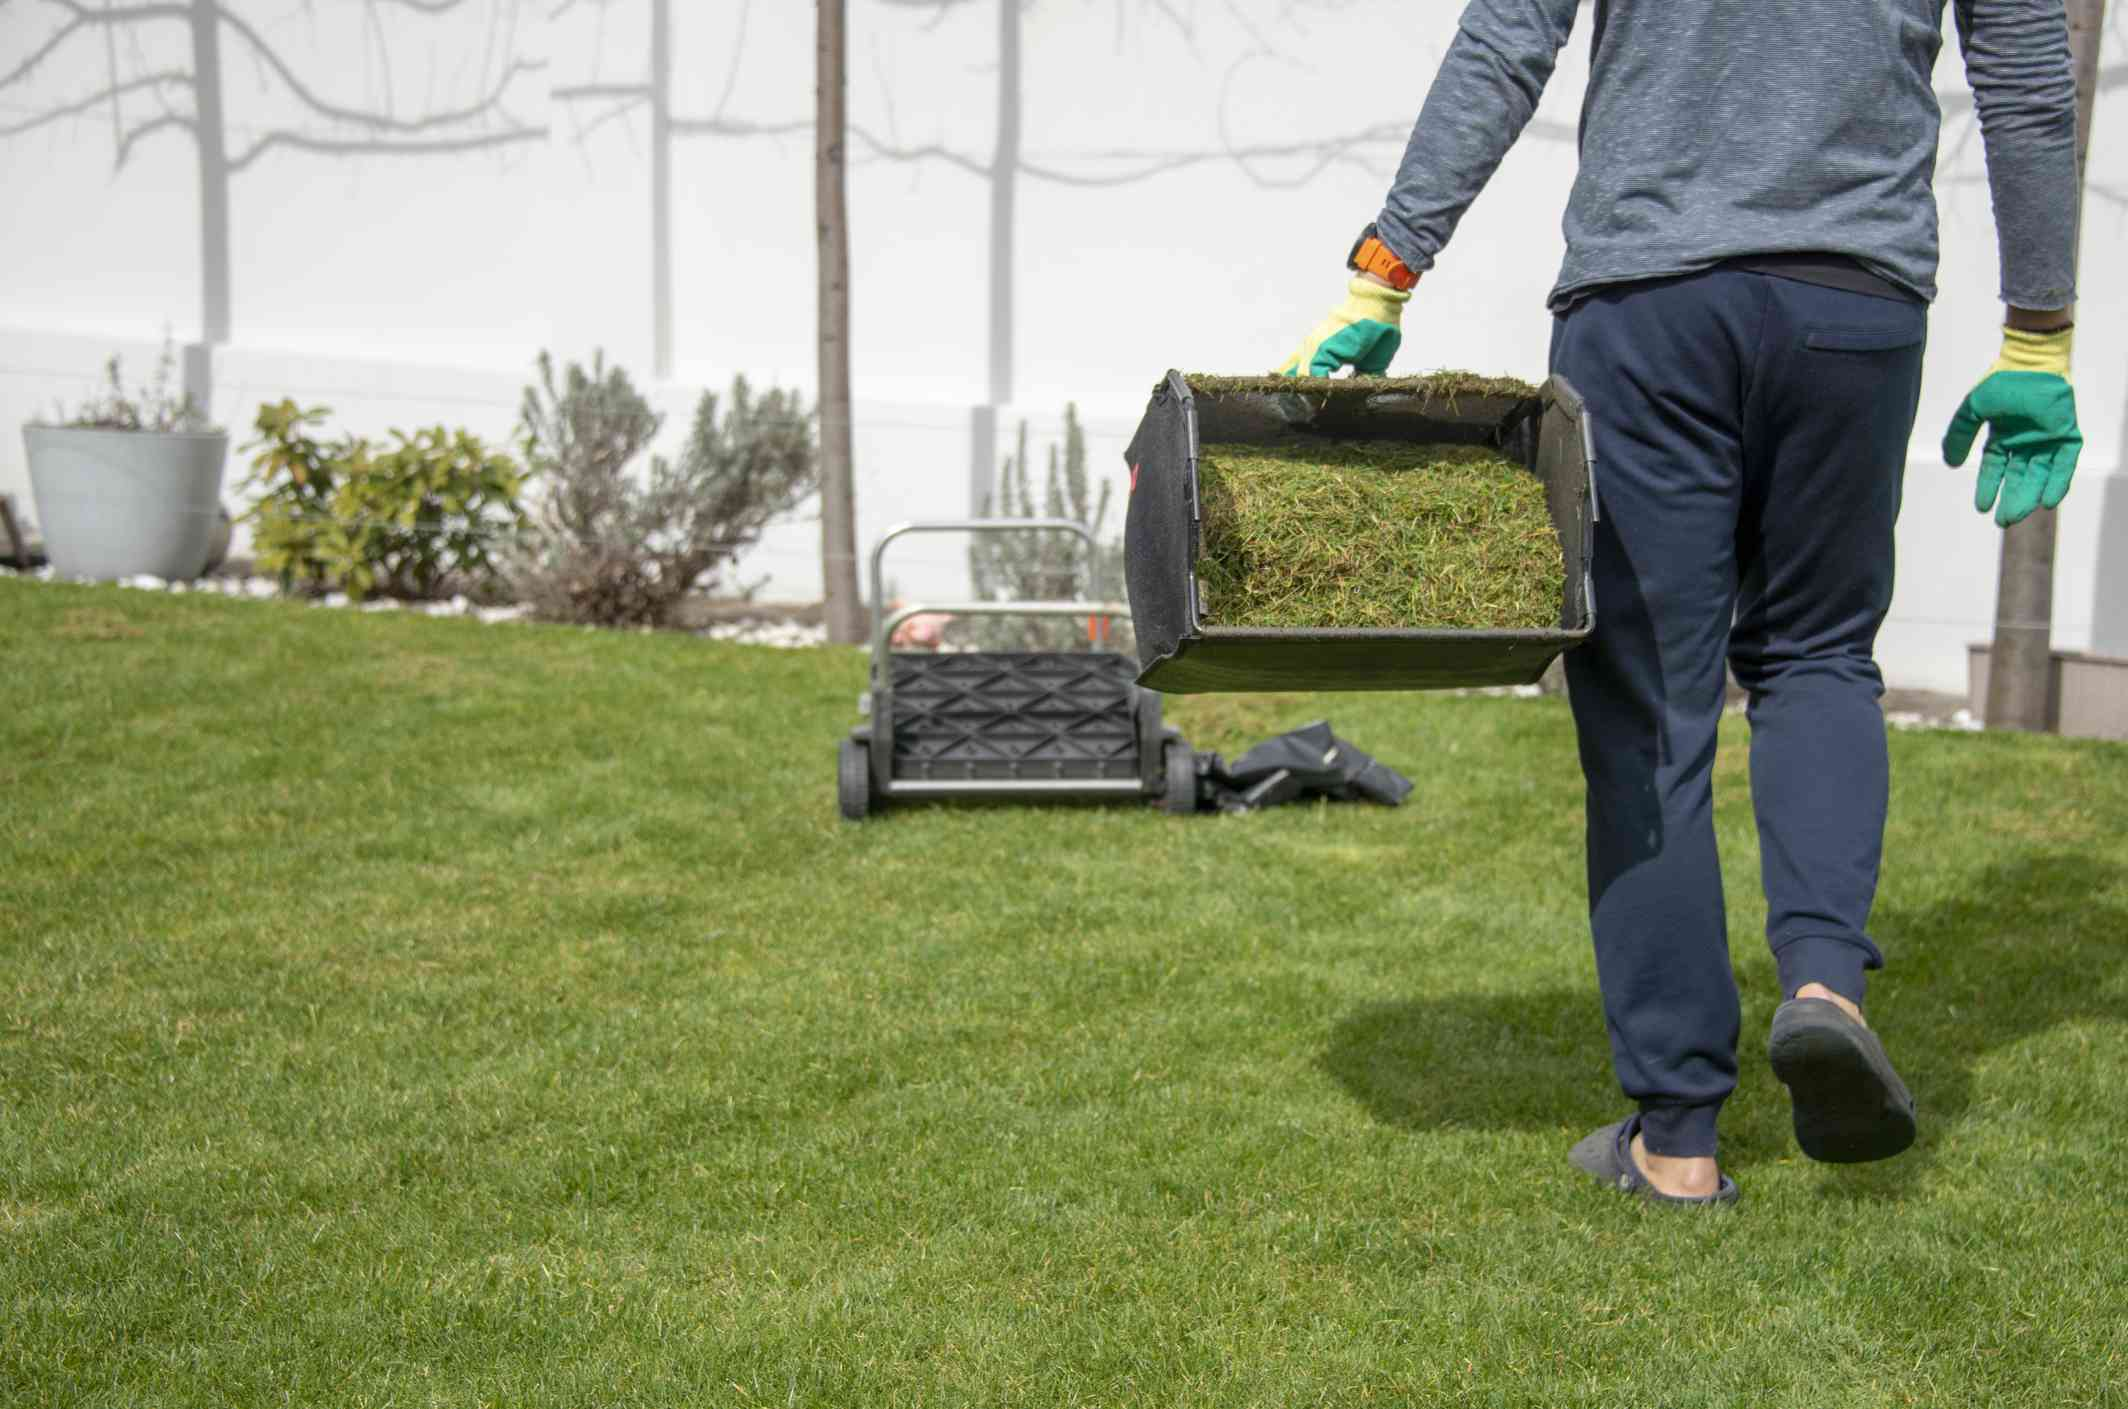 A man carrying part of lawn mower over cut grass.